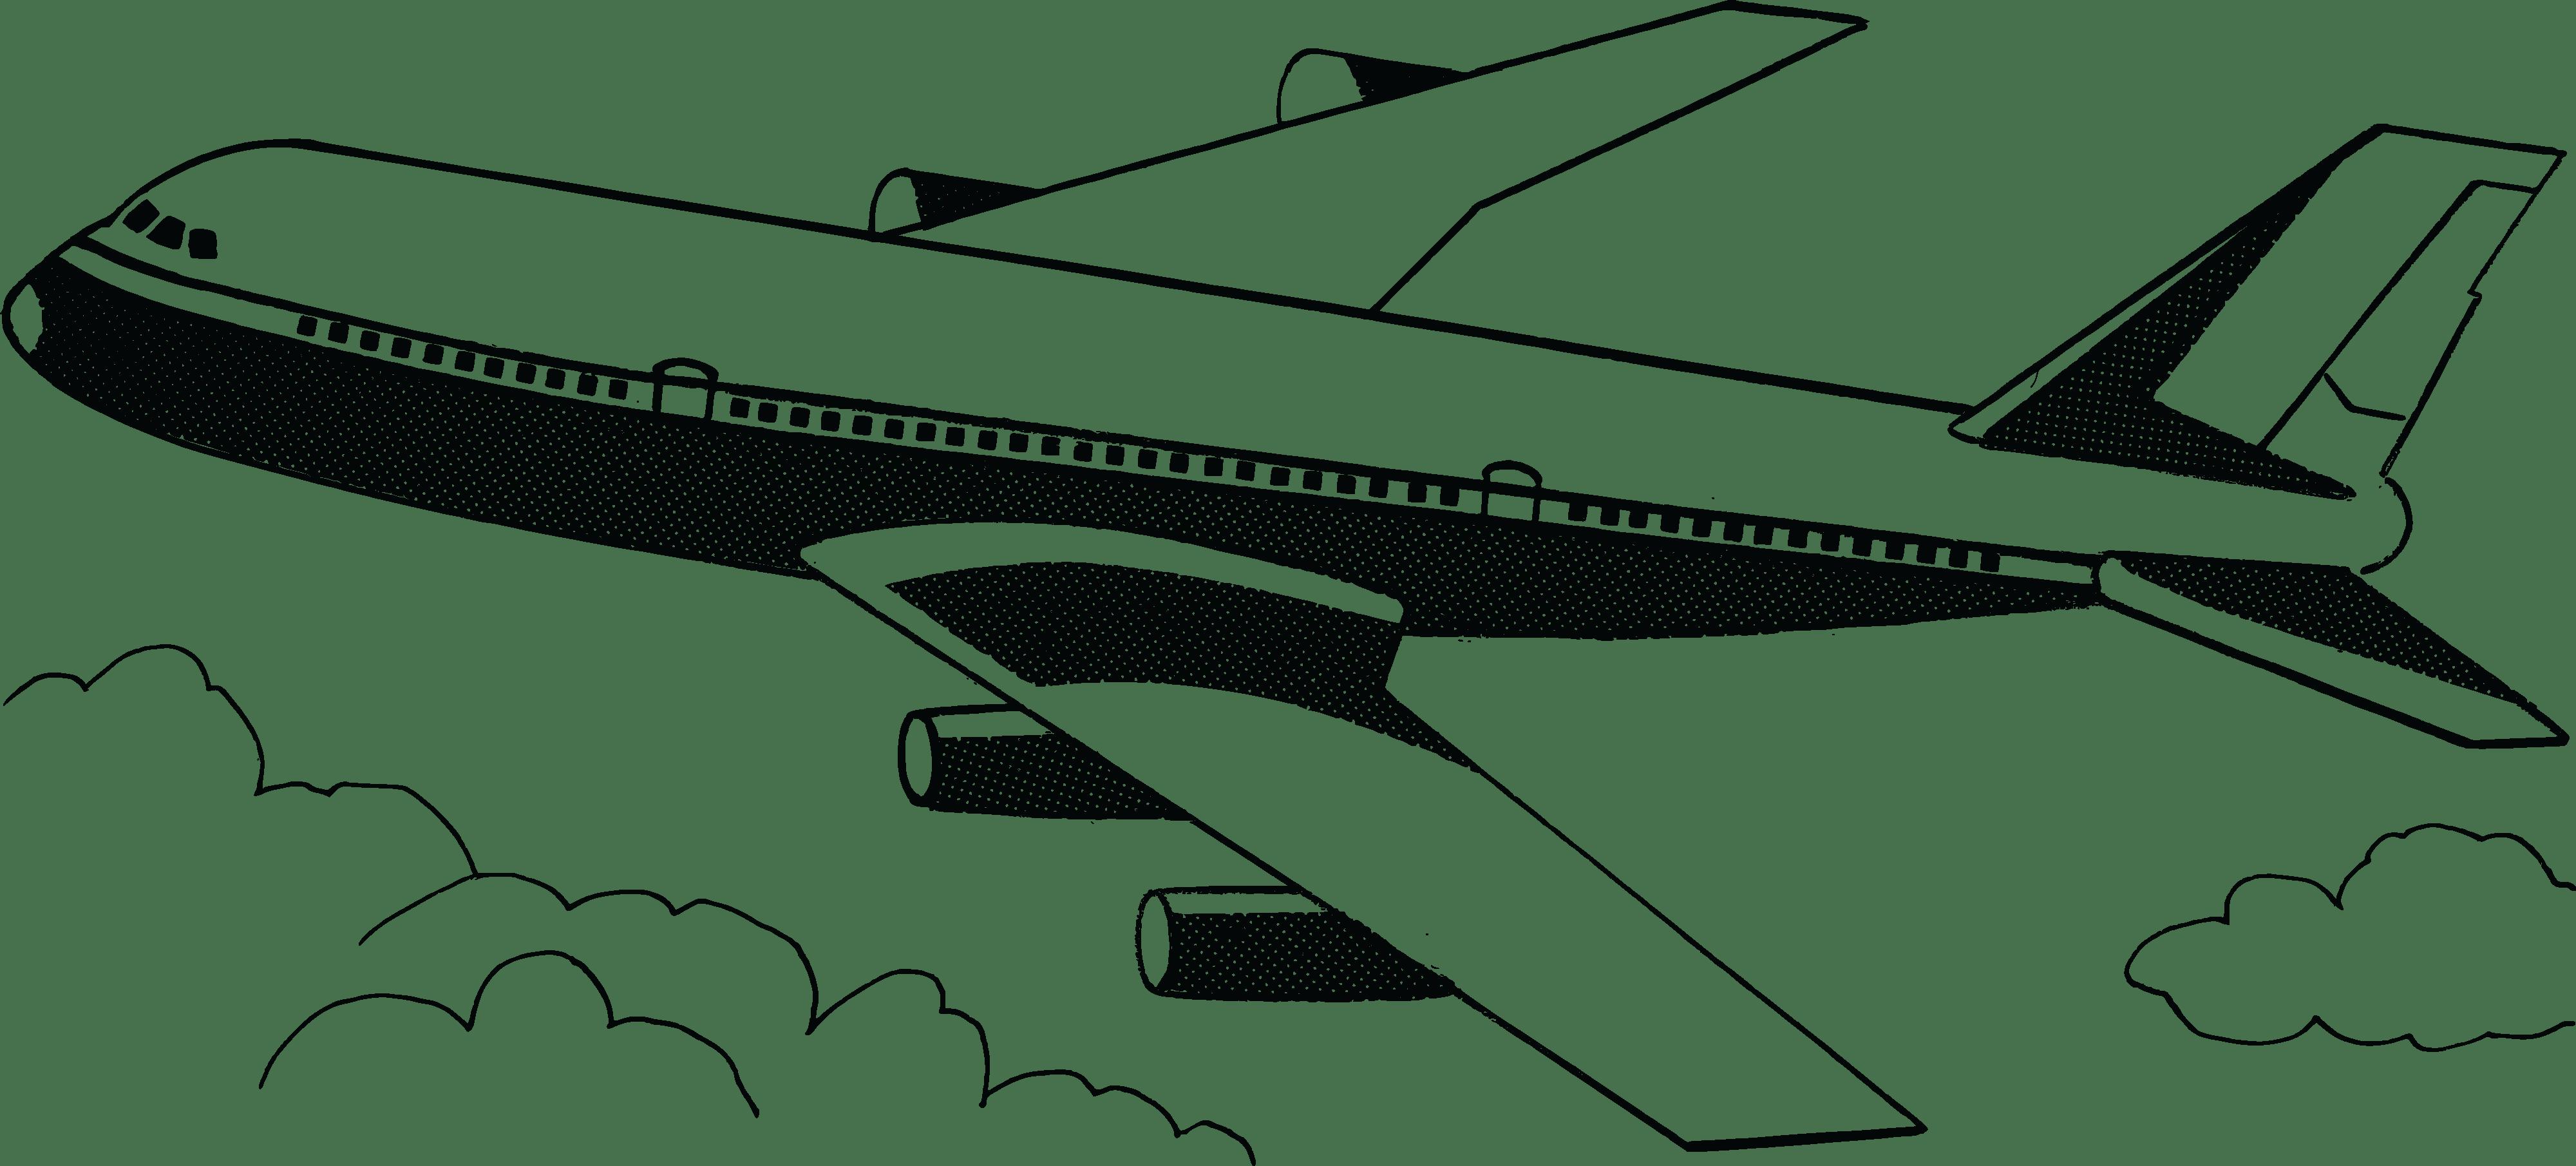 General aviation clipart 6 » Clipart Portal.